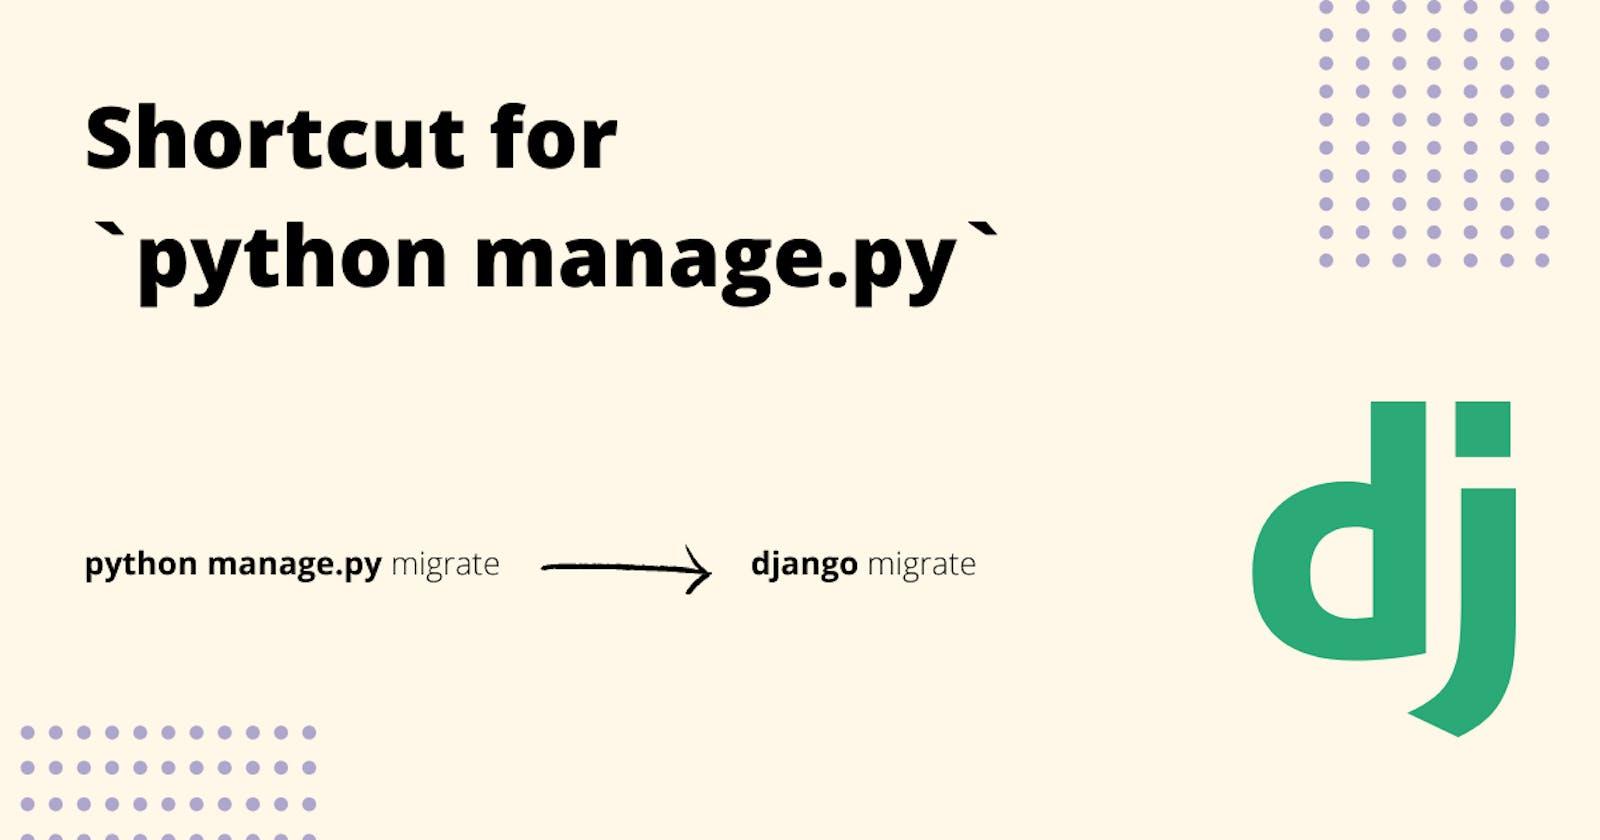 Shortcut for `python manage.py` in Django